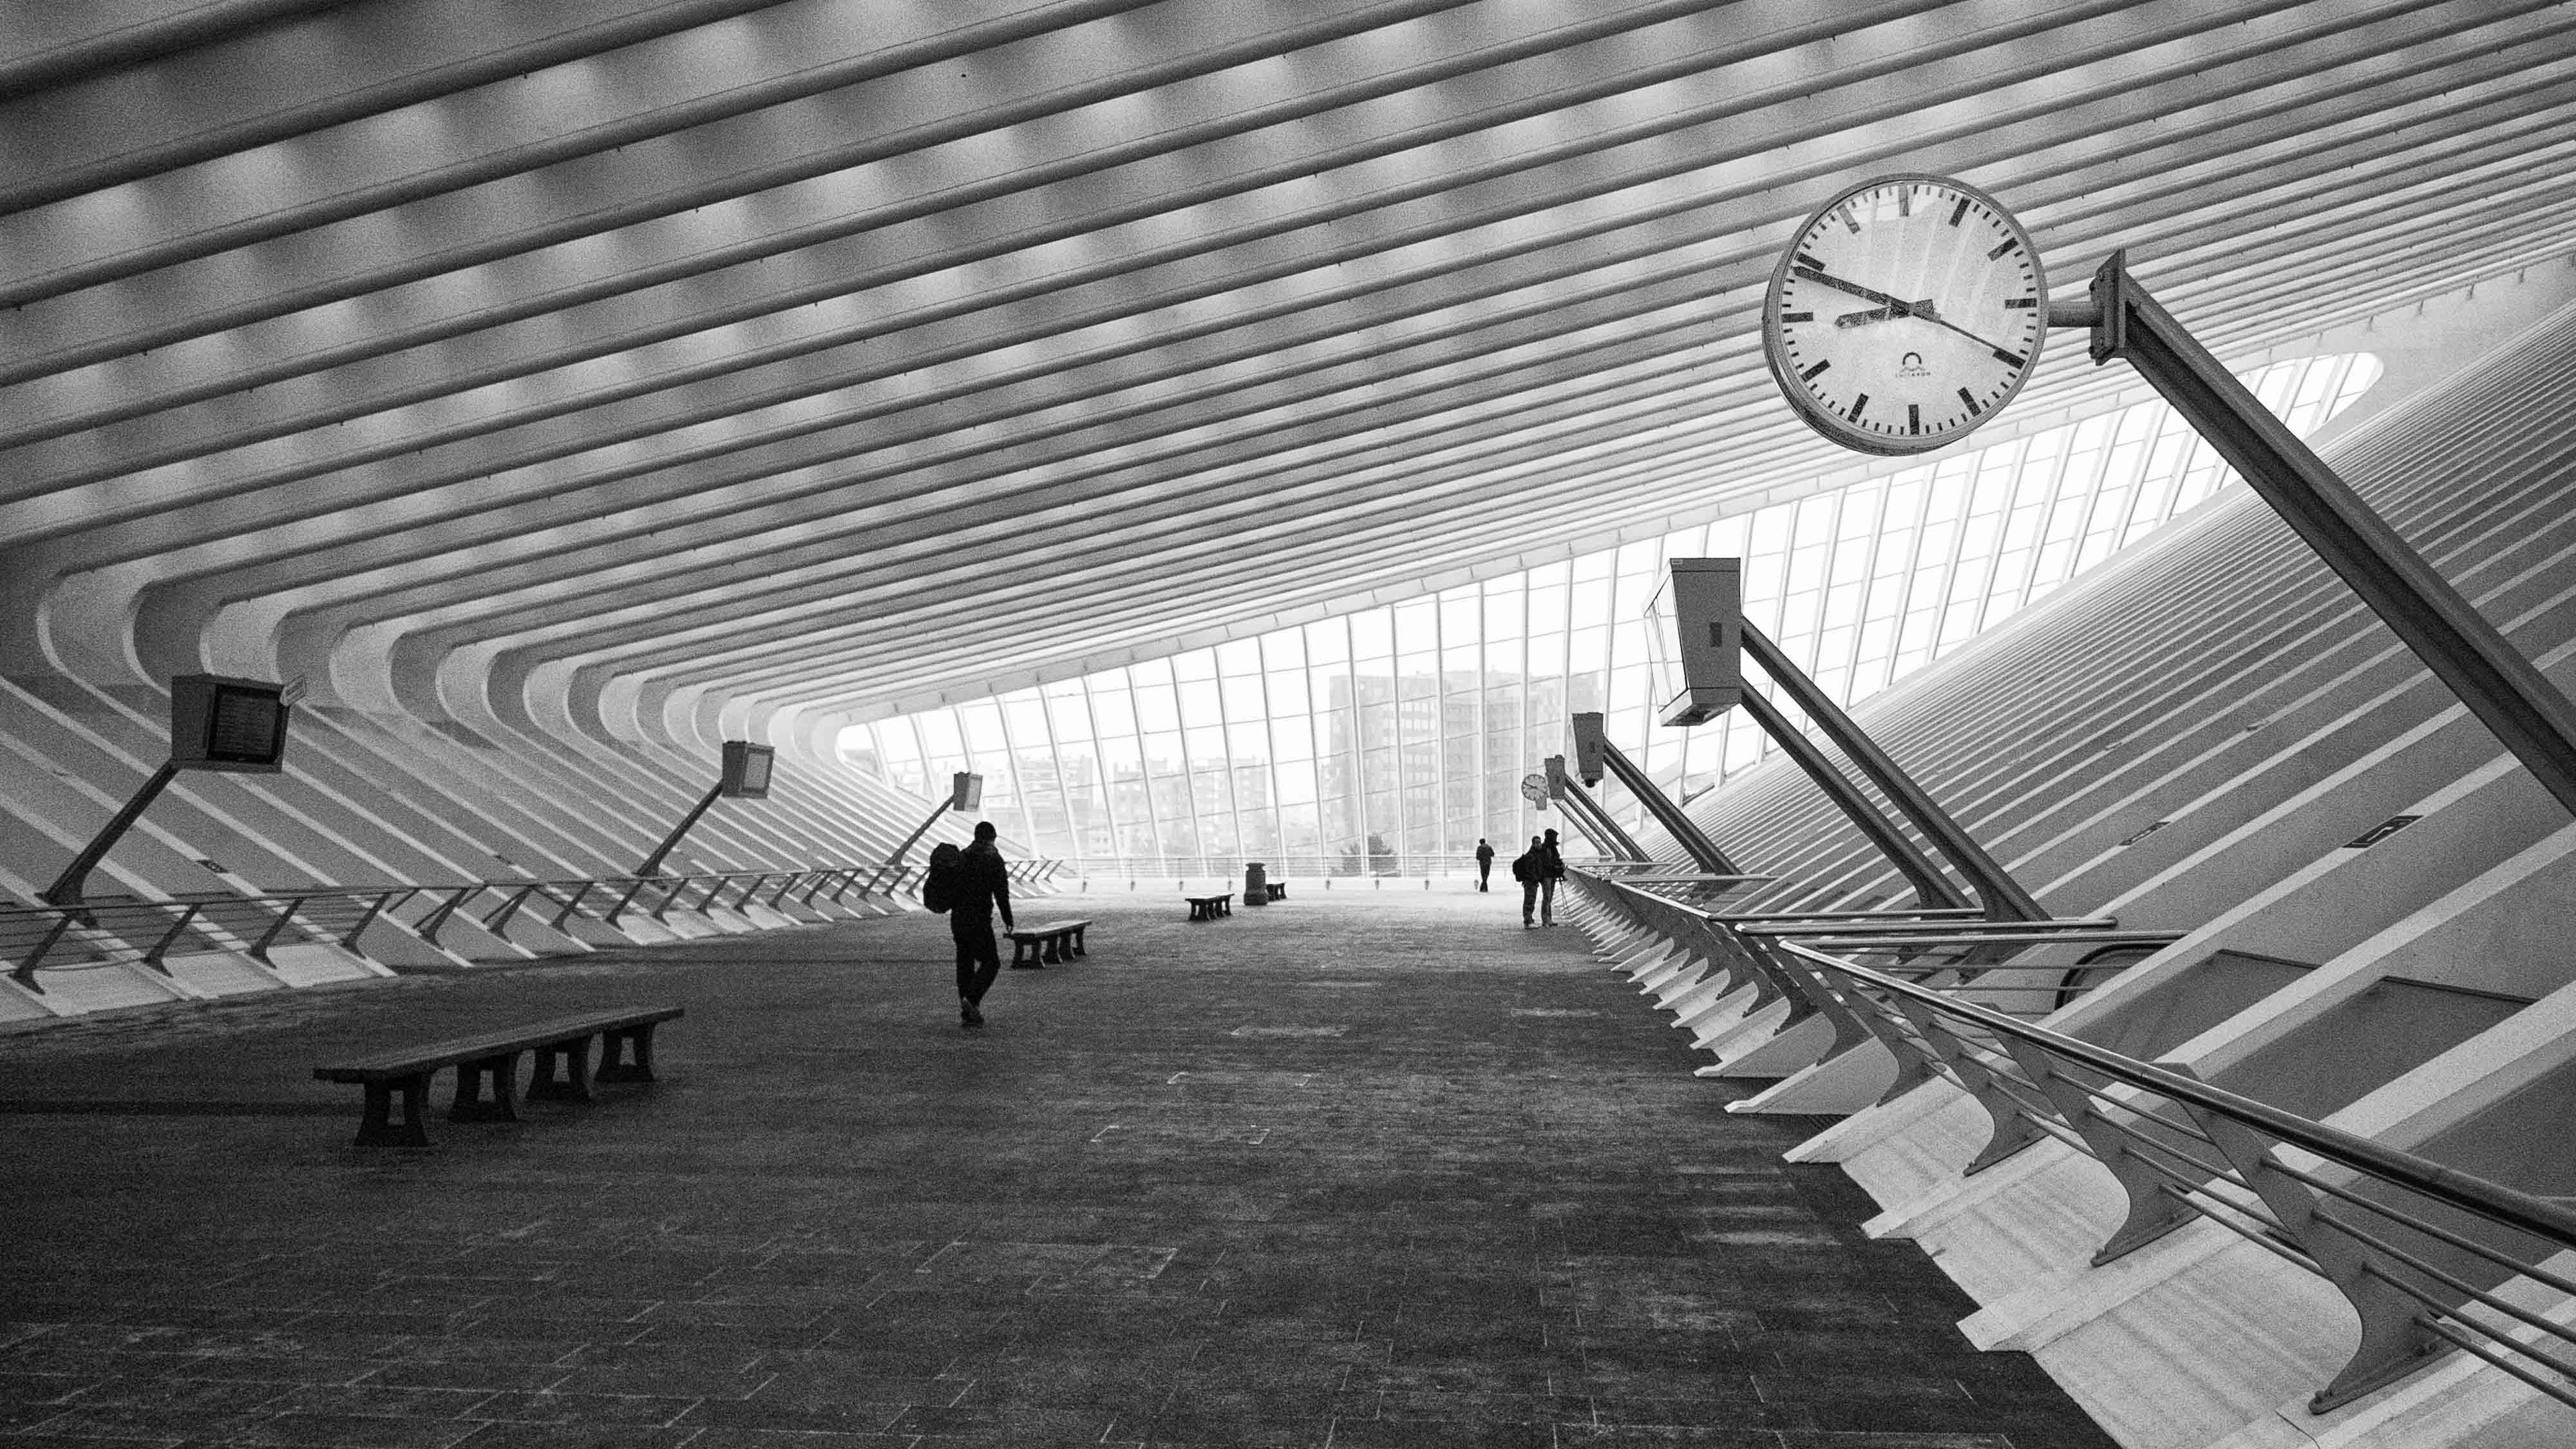 monochrome hallway architecture 1538069026 - Monochrome Hallway Architecture - world wallpapers, monochrome wallpapers, architecture wallpapers